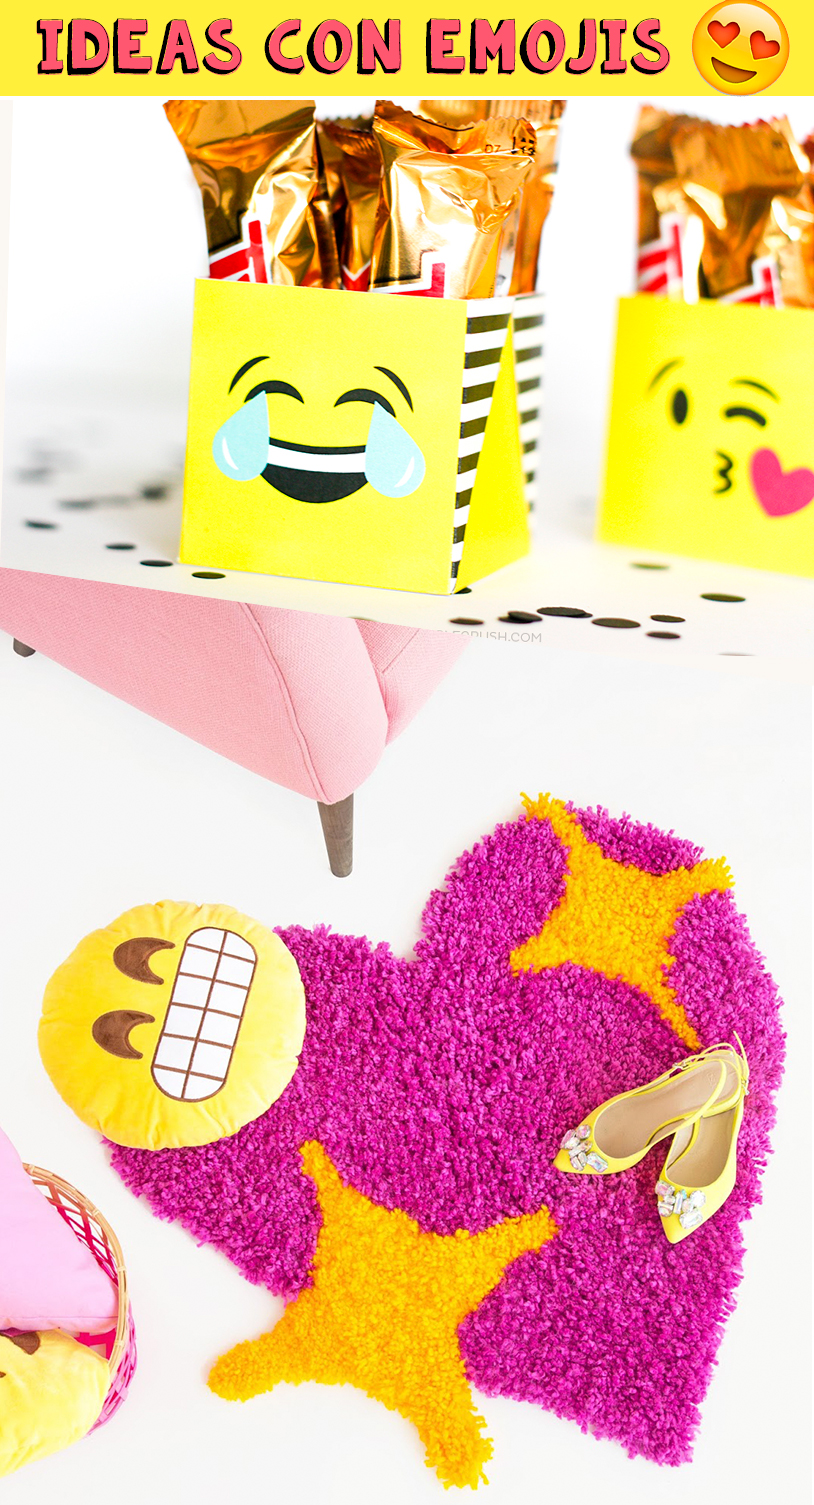 ideas con emojis_PORT